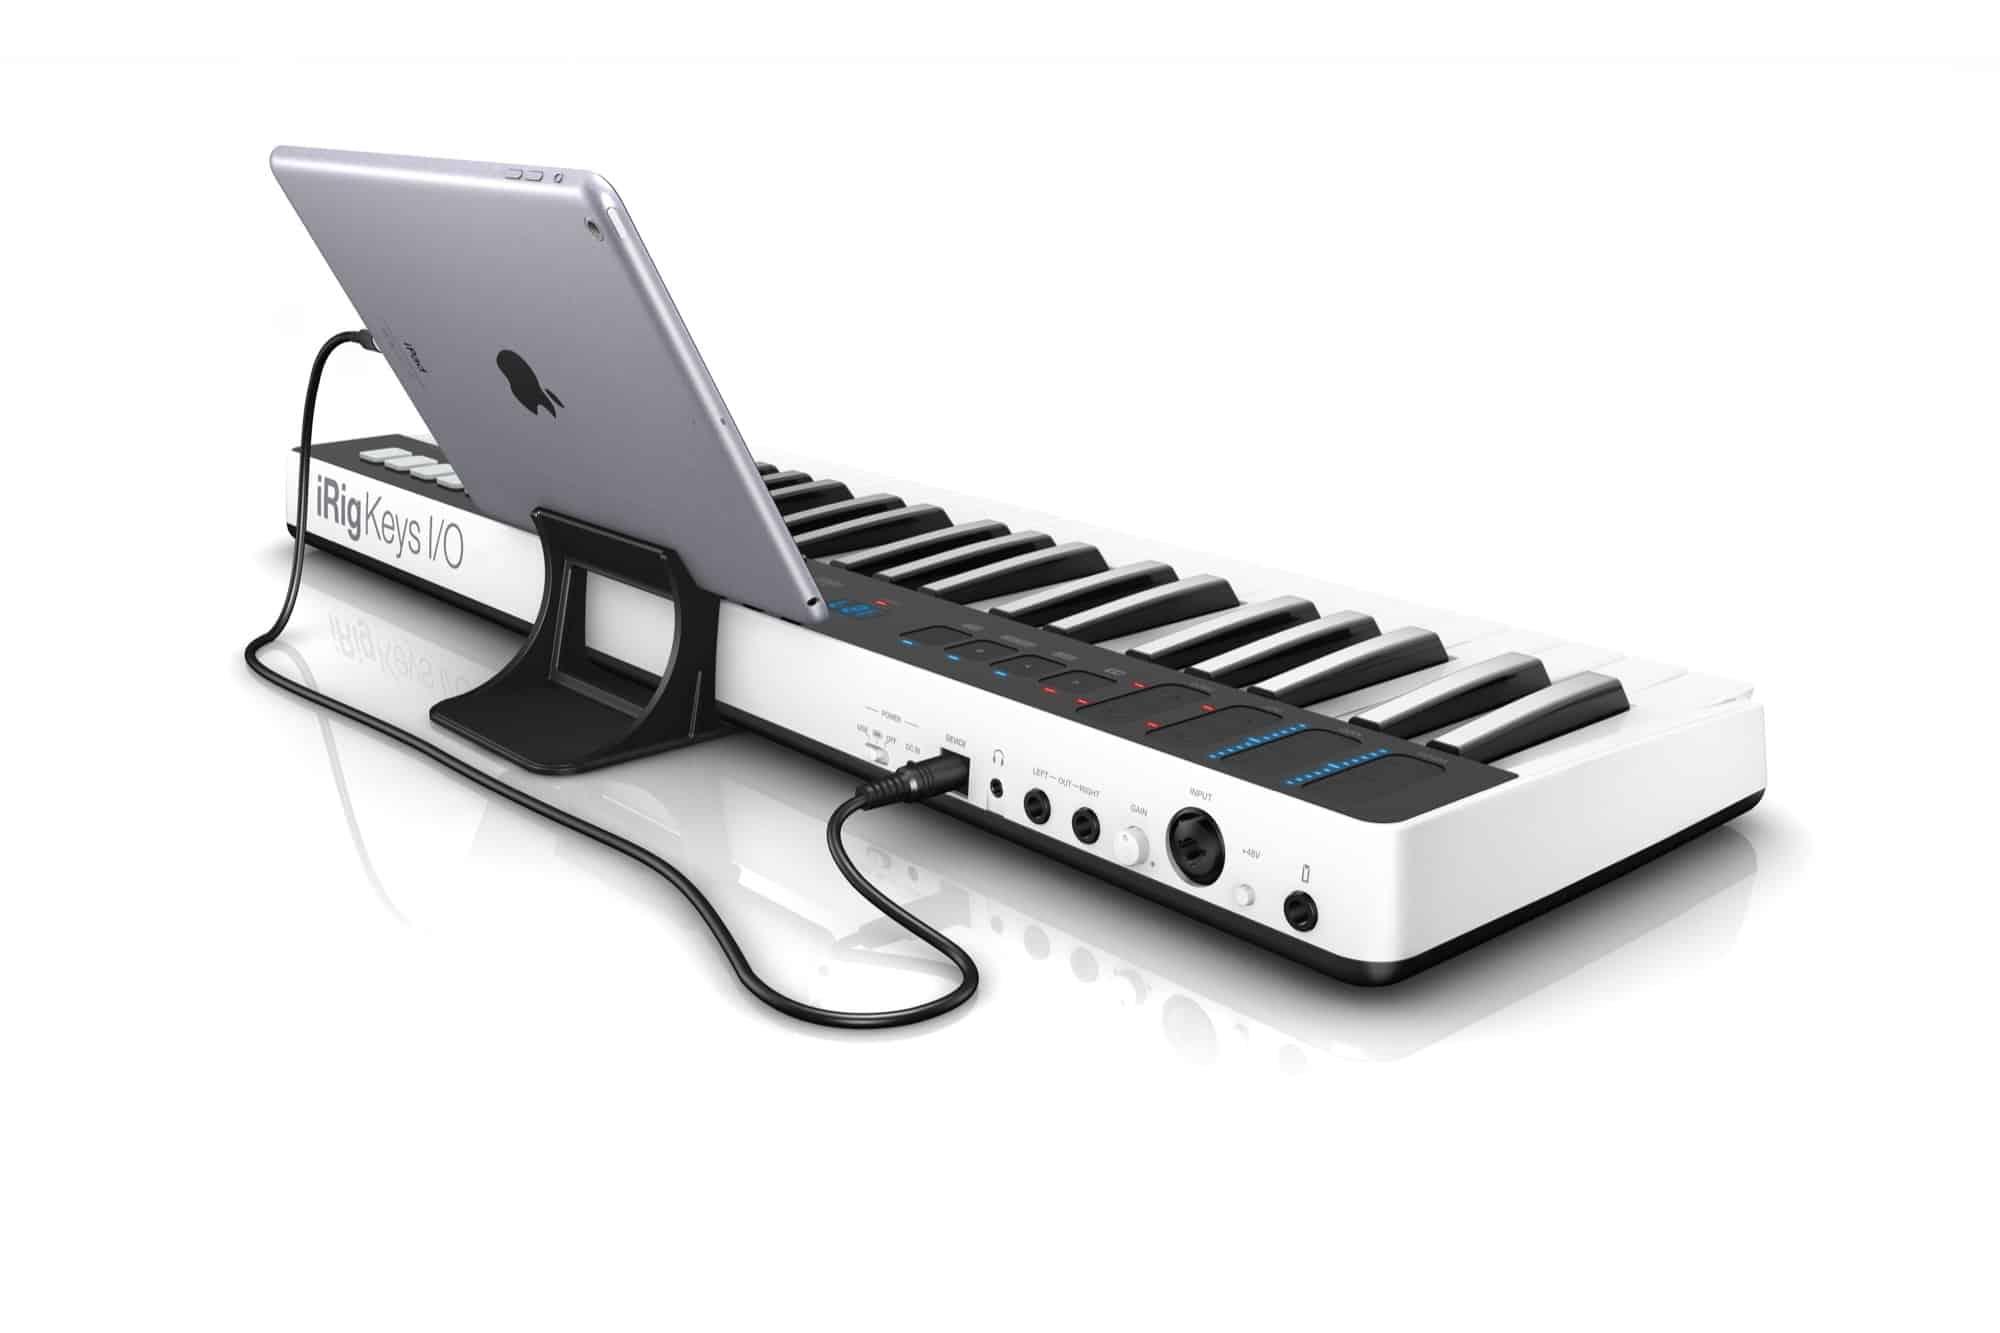 iRig Keys IO is all you need to make music on iOS and Mac